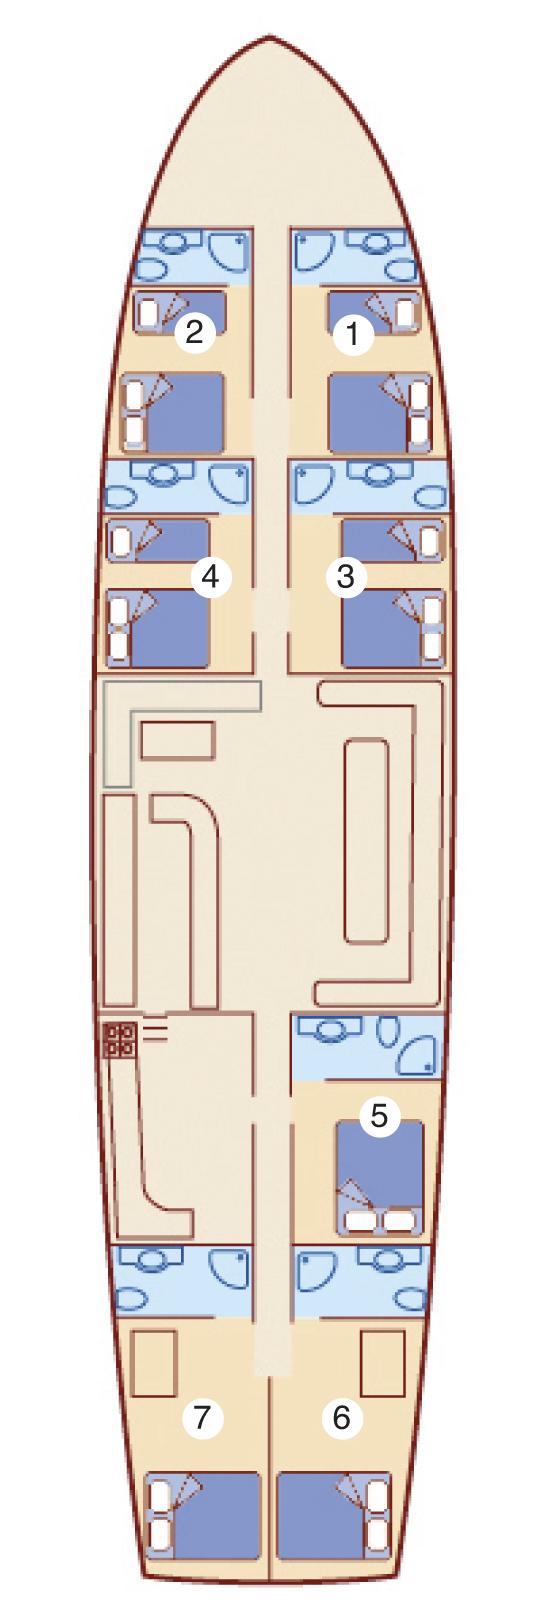 Sunworld-VI-layout.jpg